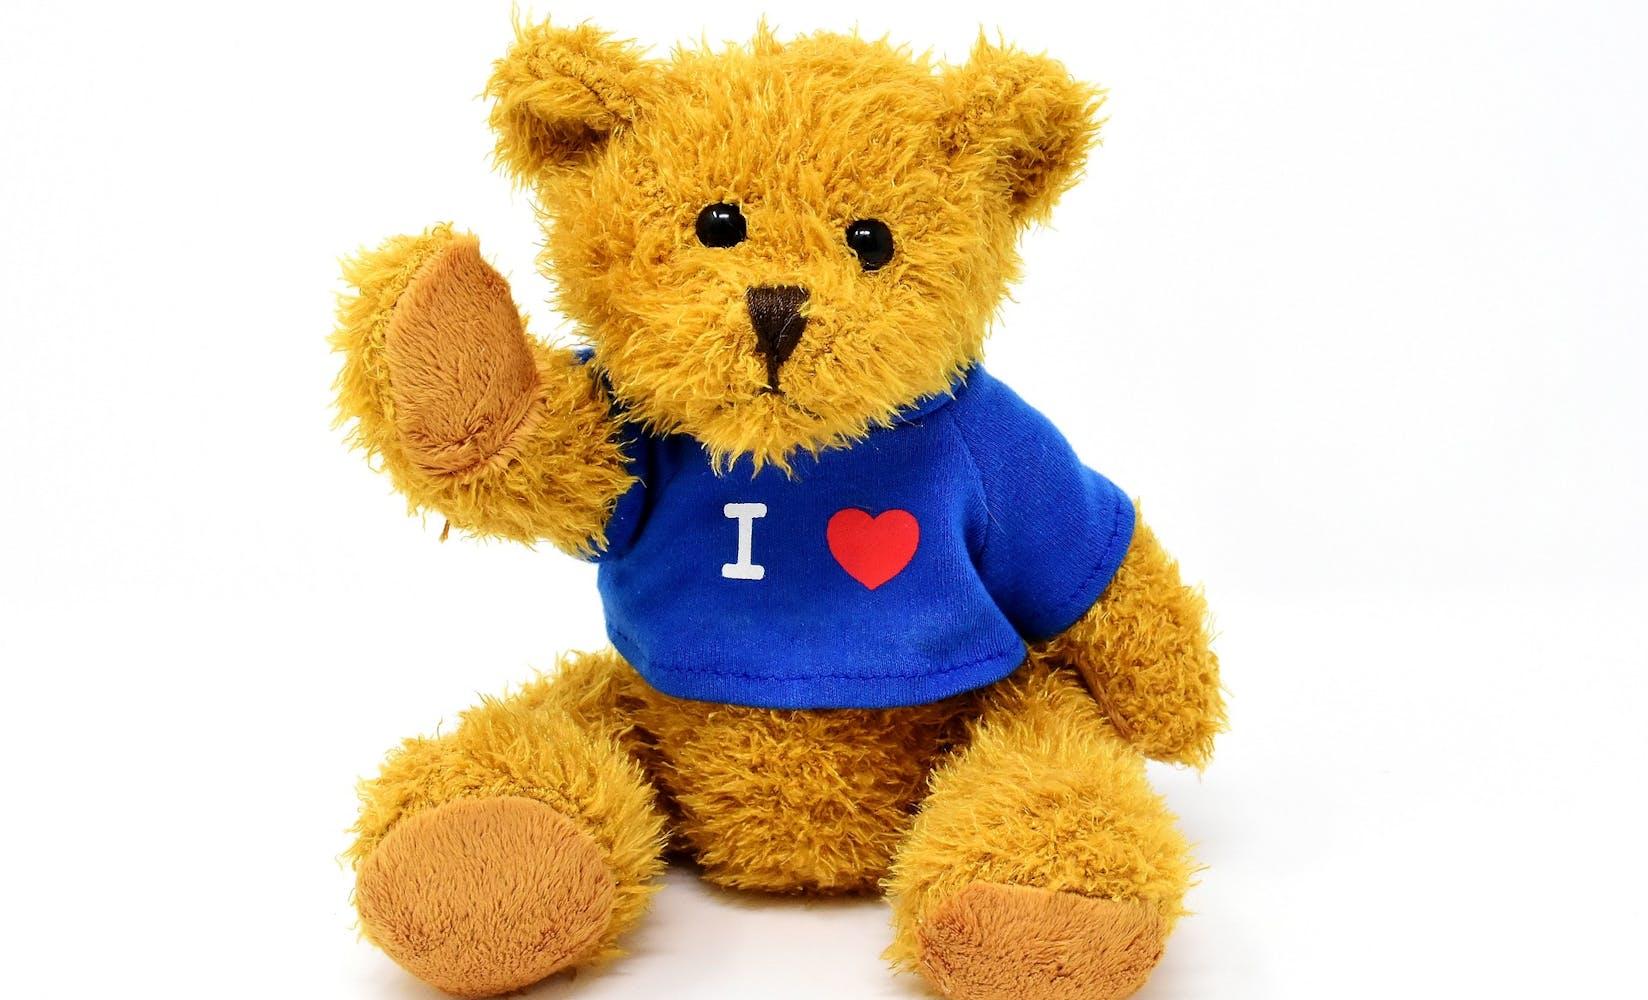 Teddy 3296851 1920